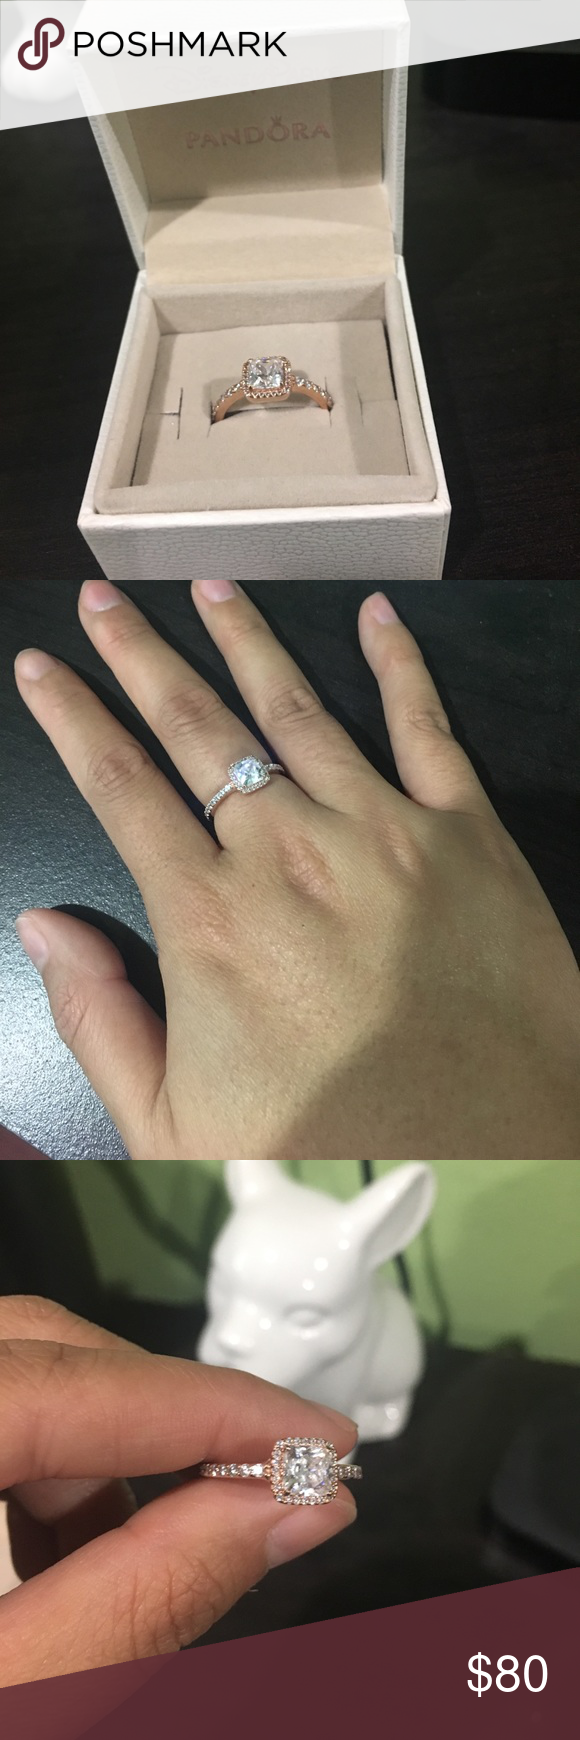 2e1c42742 Pandora Rose Timeless Elegance Ring Pandora Rose Gold Timeless Elegance Ring  size 52/6-6.5. Brand New bought as a fun ring then got a real engagement  ring.